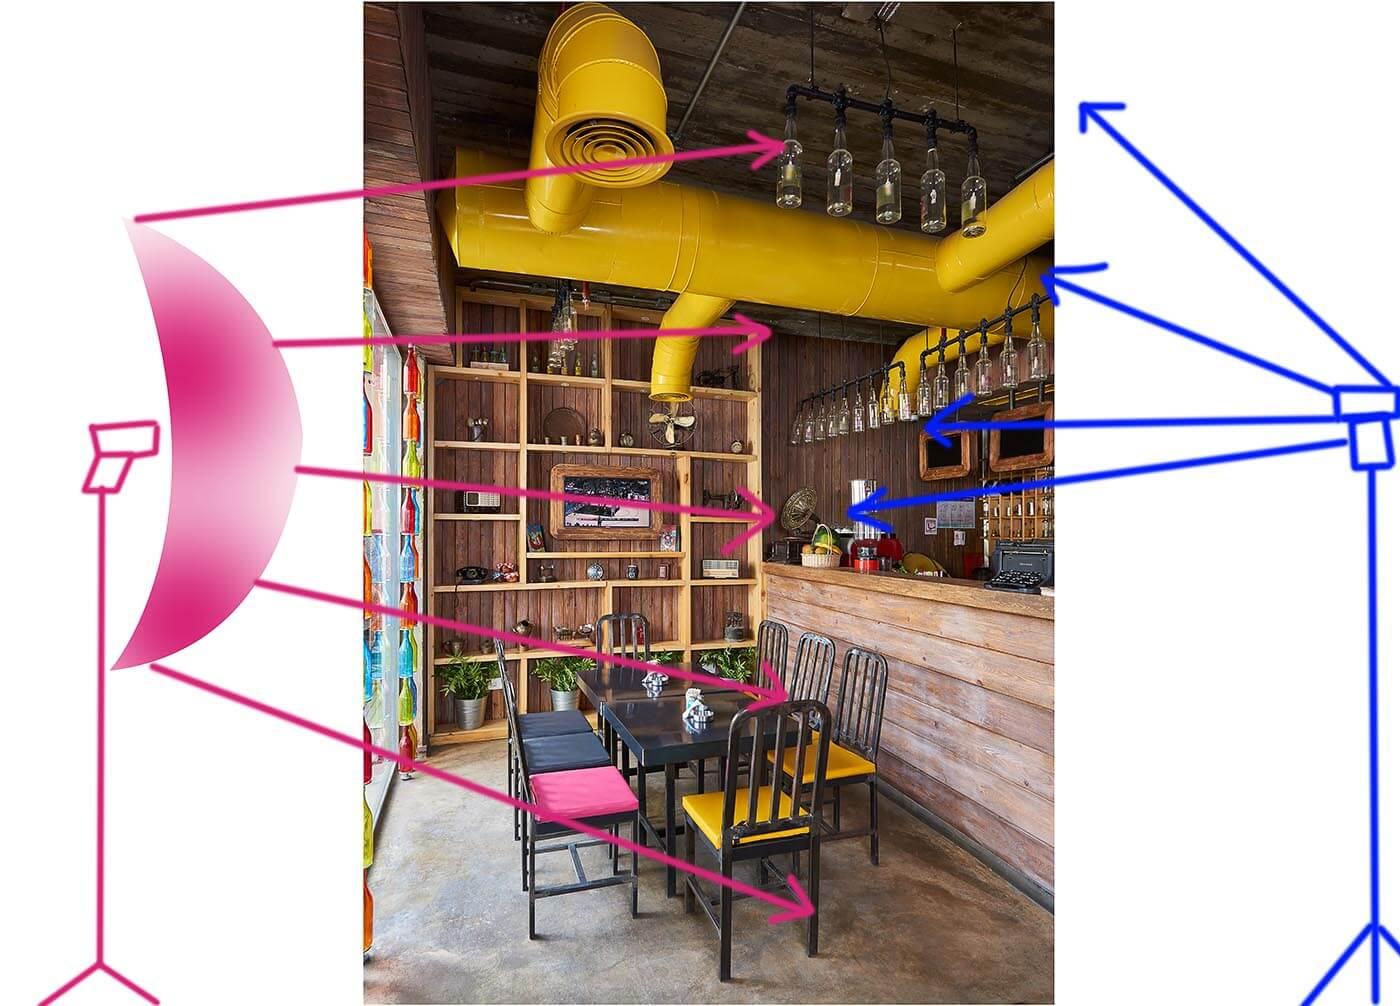 lighting-setup-tabali-restaurant-interiors-blog-post-image